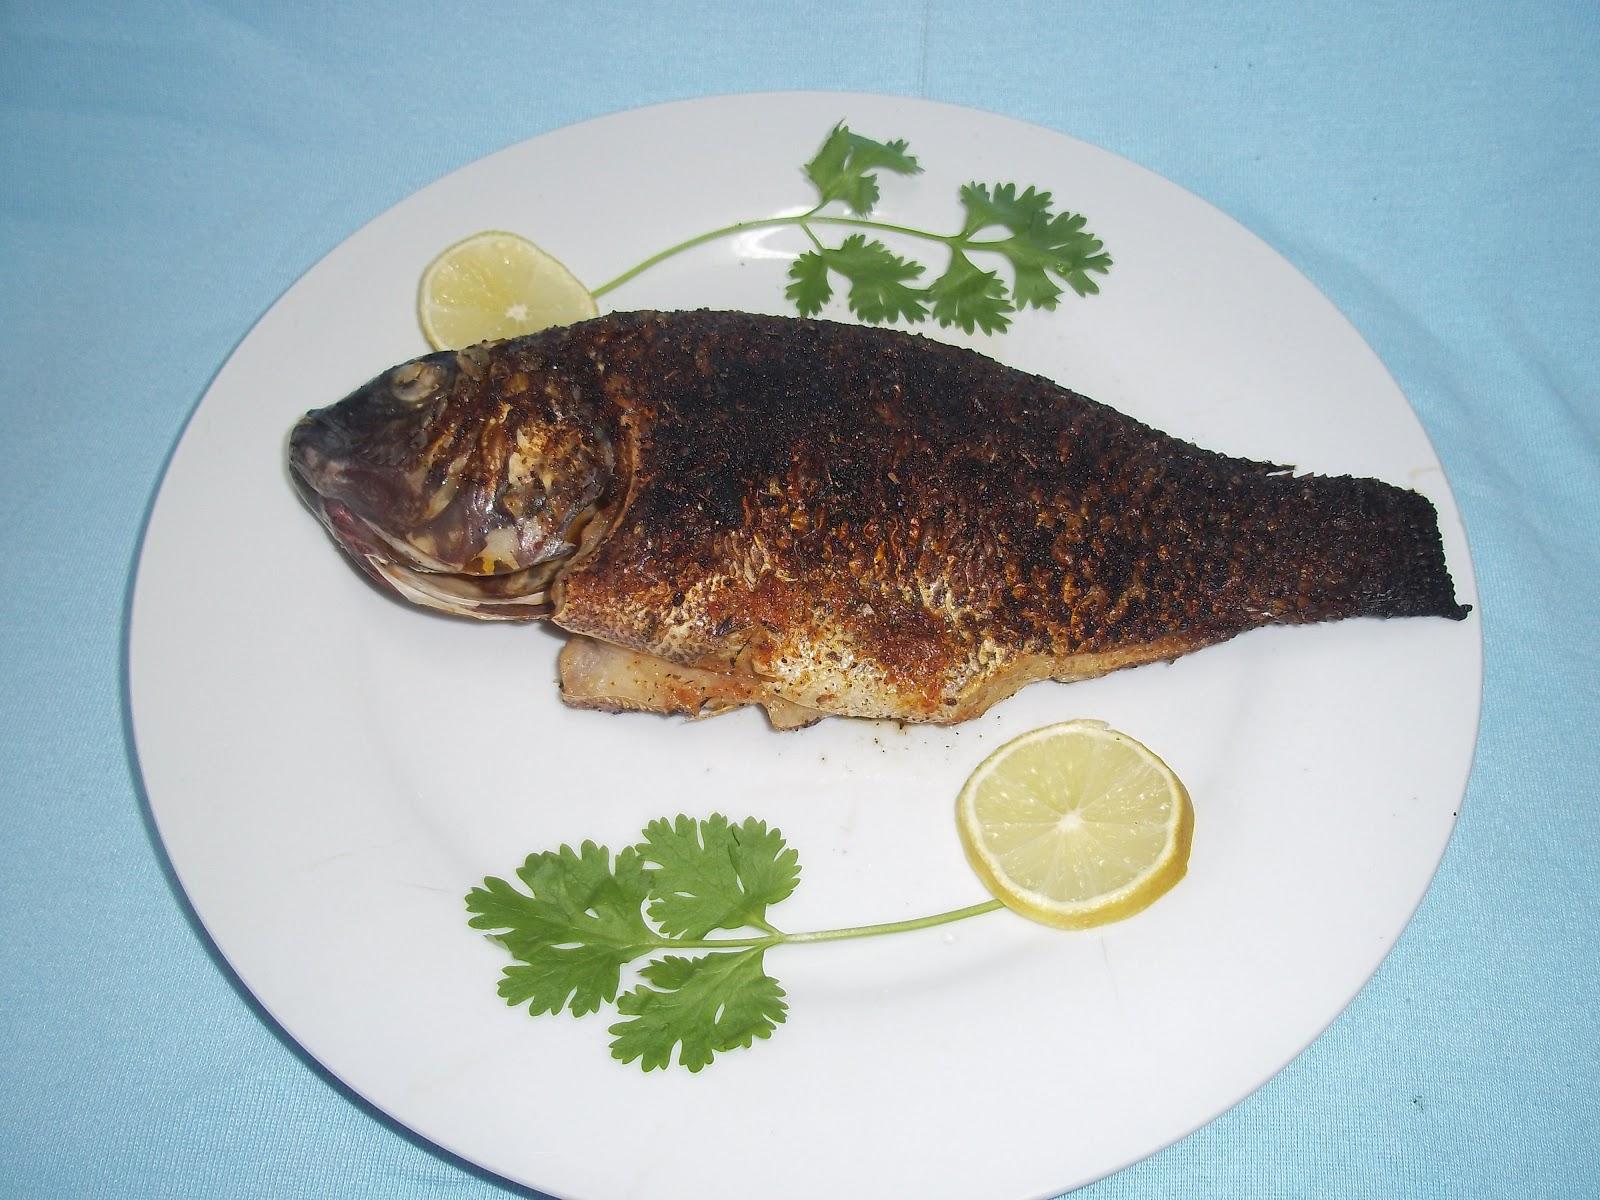 Blackened fish recipe 2 ways penniless parenting for Blackened fish recipe